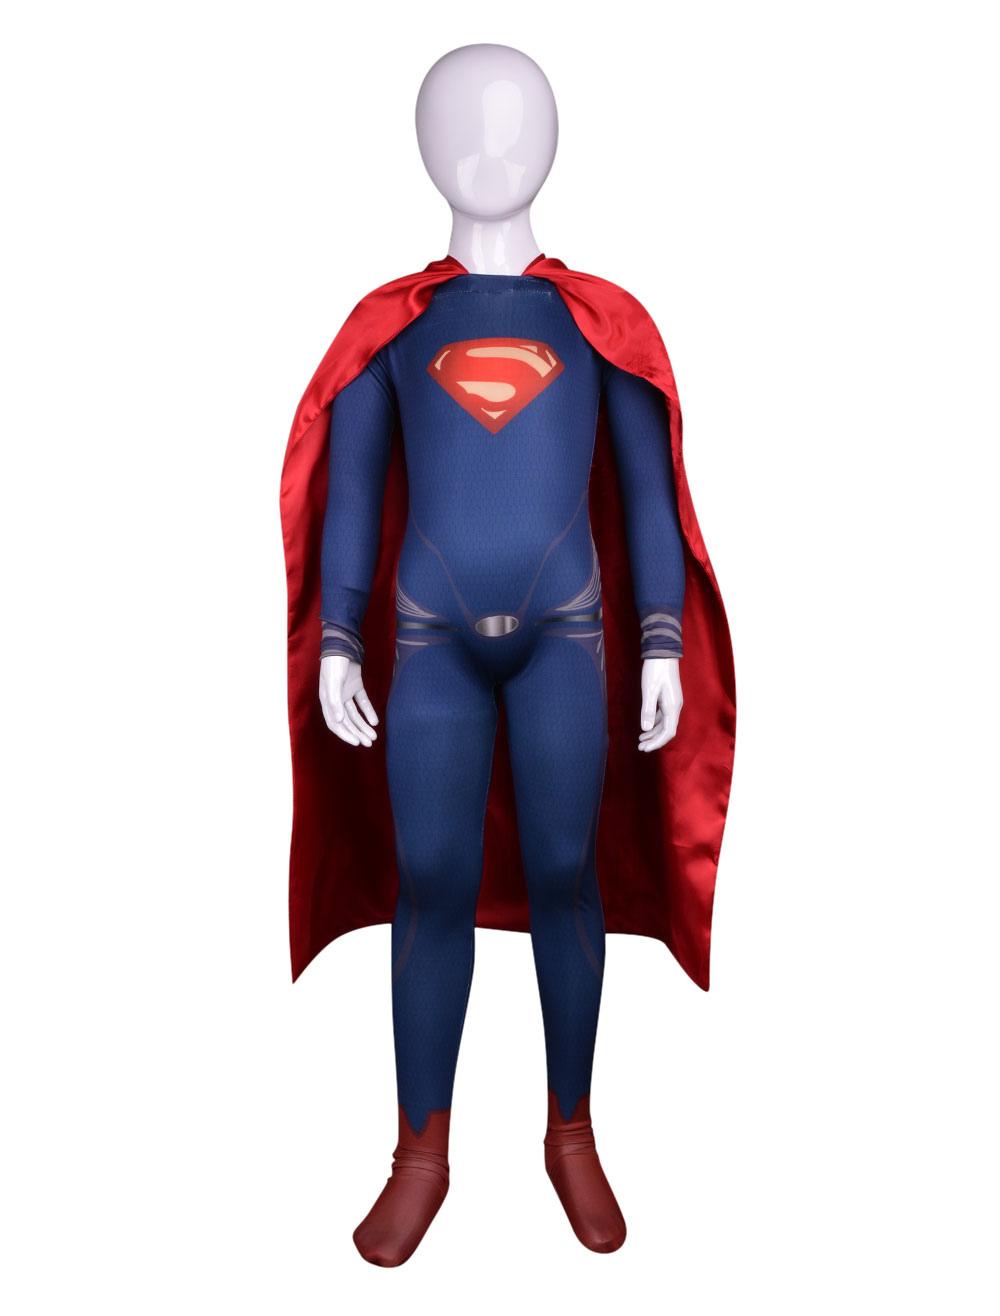 Унисекс Супермен Хэллоуин лайкра комбинезон с плащ многоцветной ... aafcc266604f3